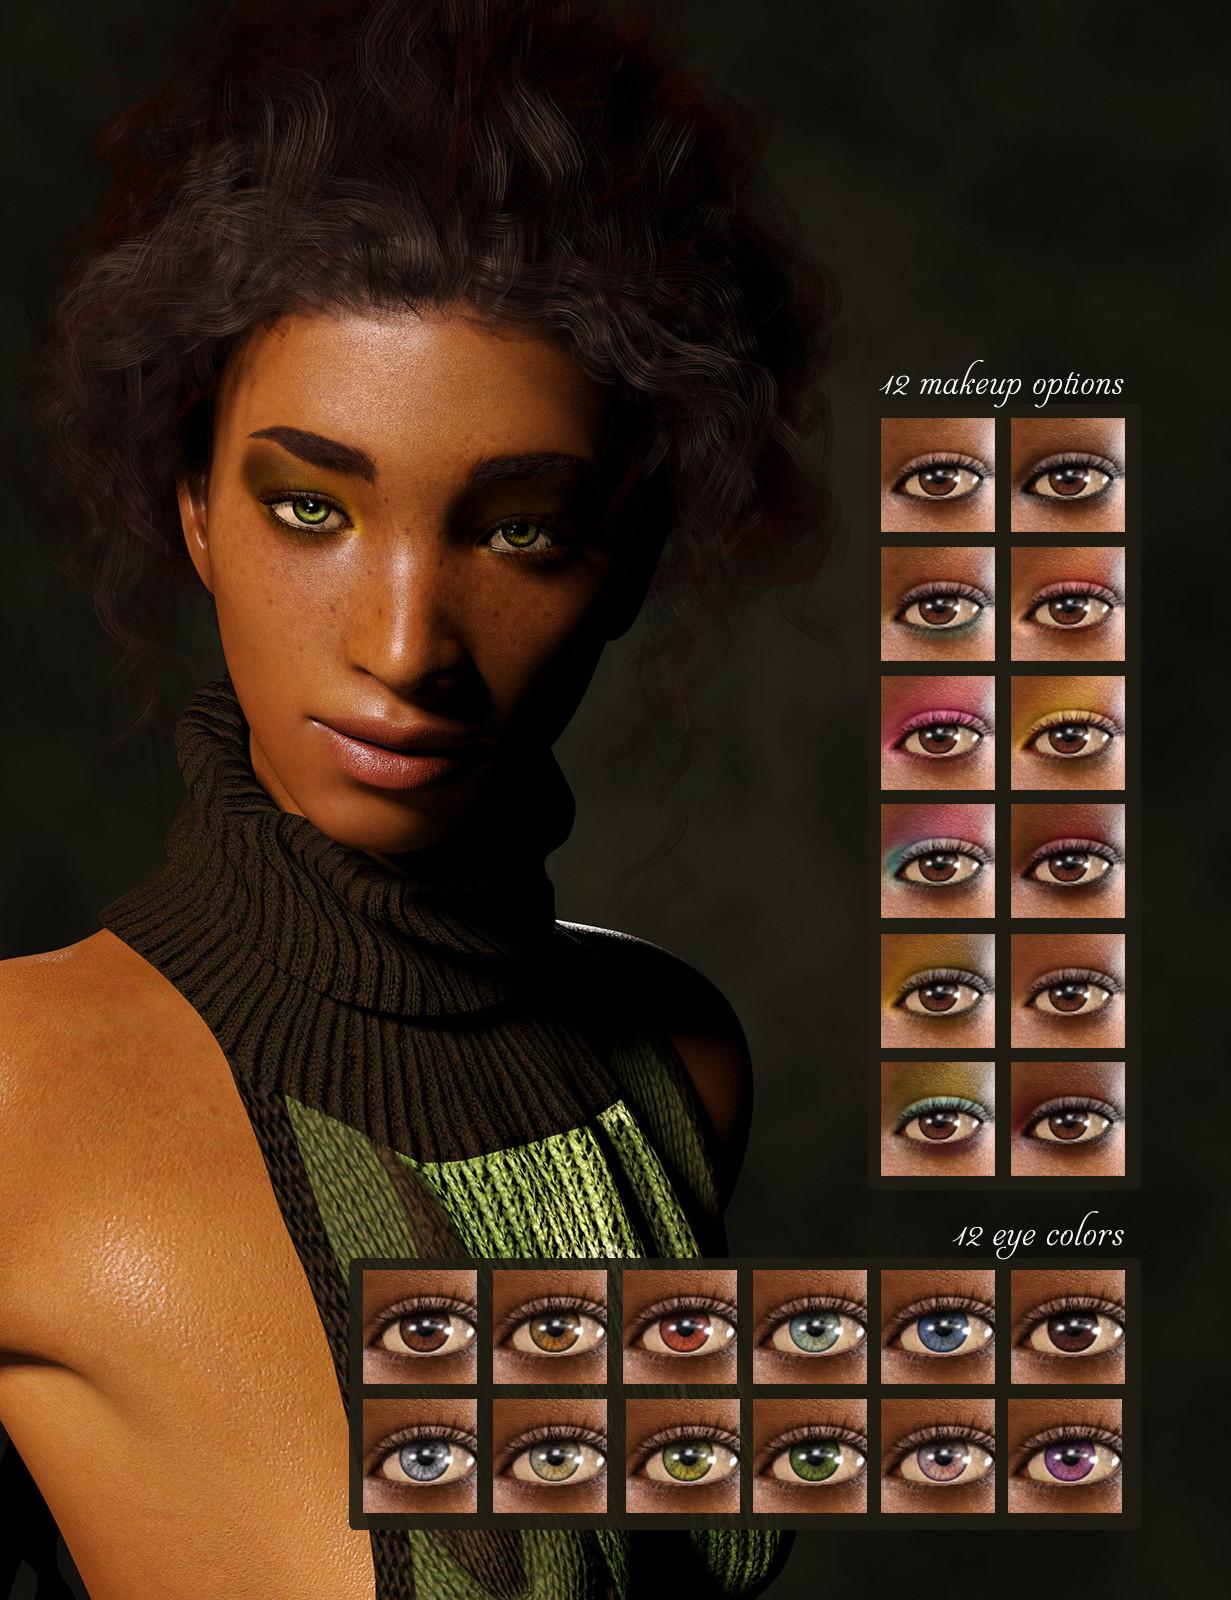 Eye colors & makeup options